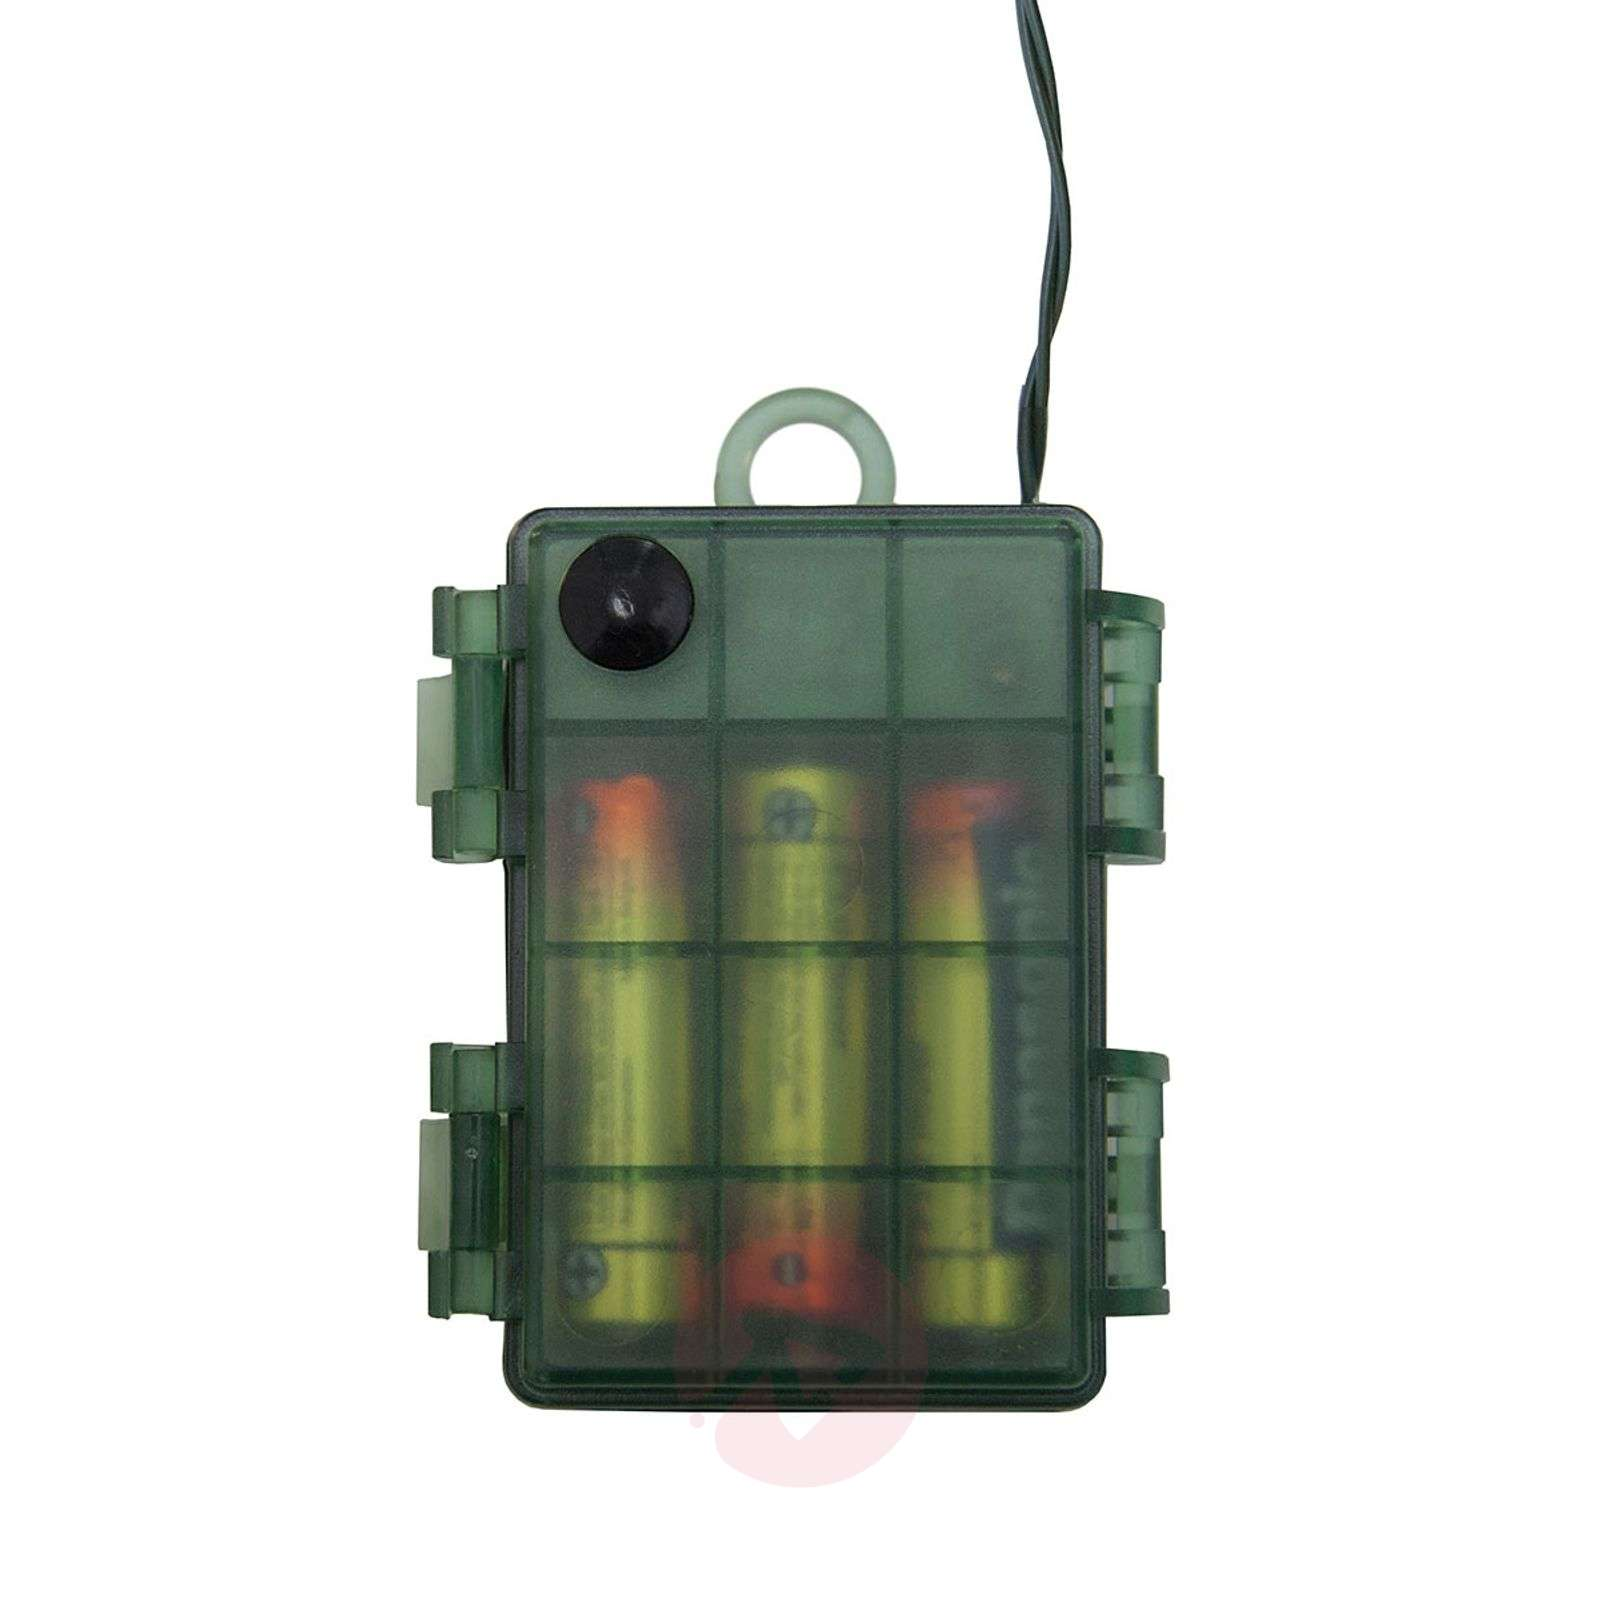 Hämärätunnistin integroitu LED-kranssi Alaska-1523473-01